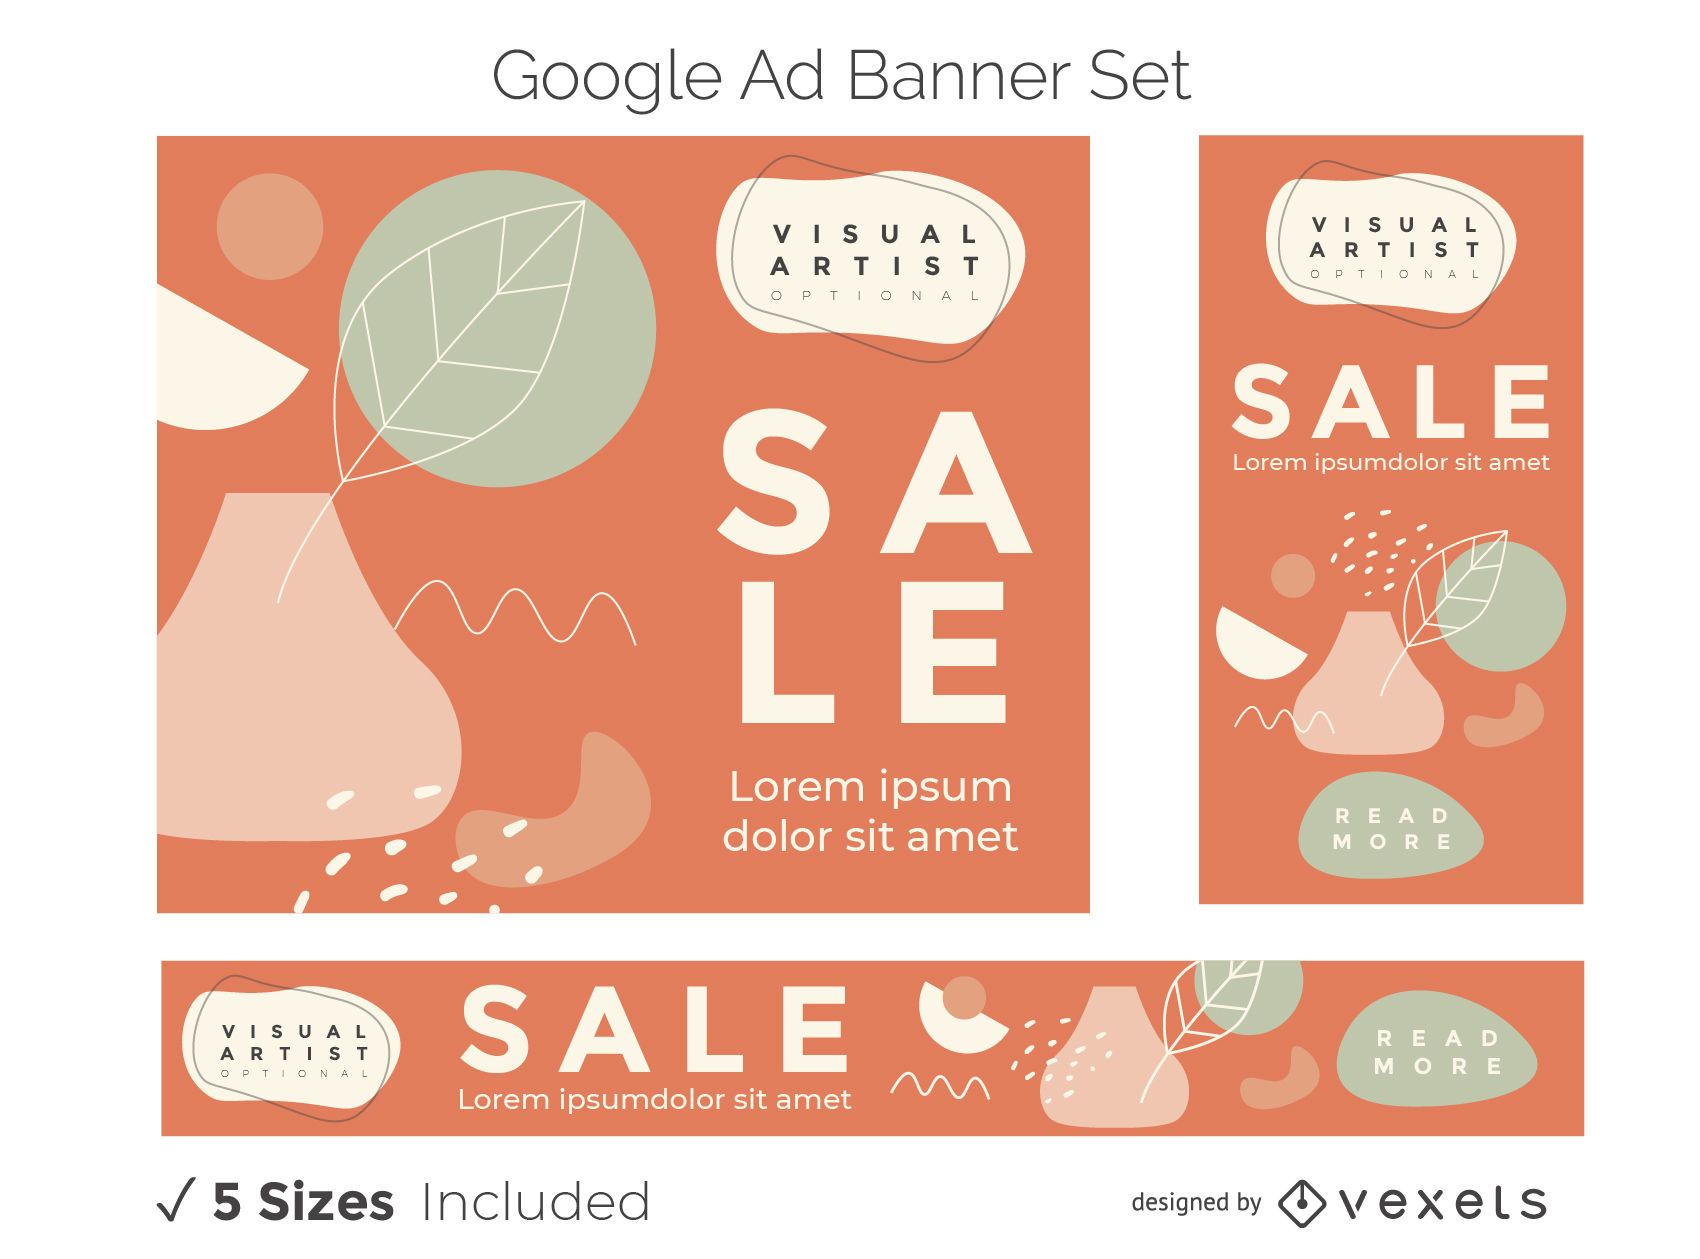 Visual artist ad banner set